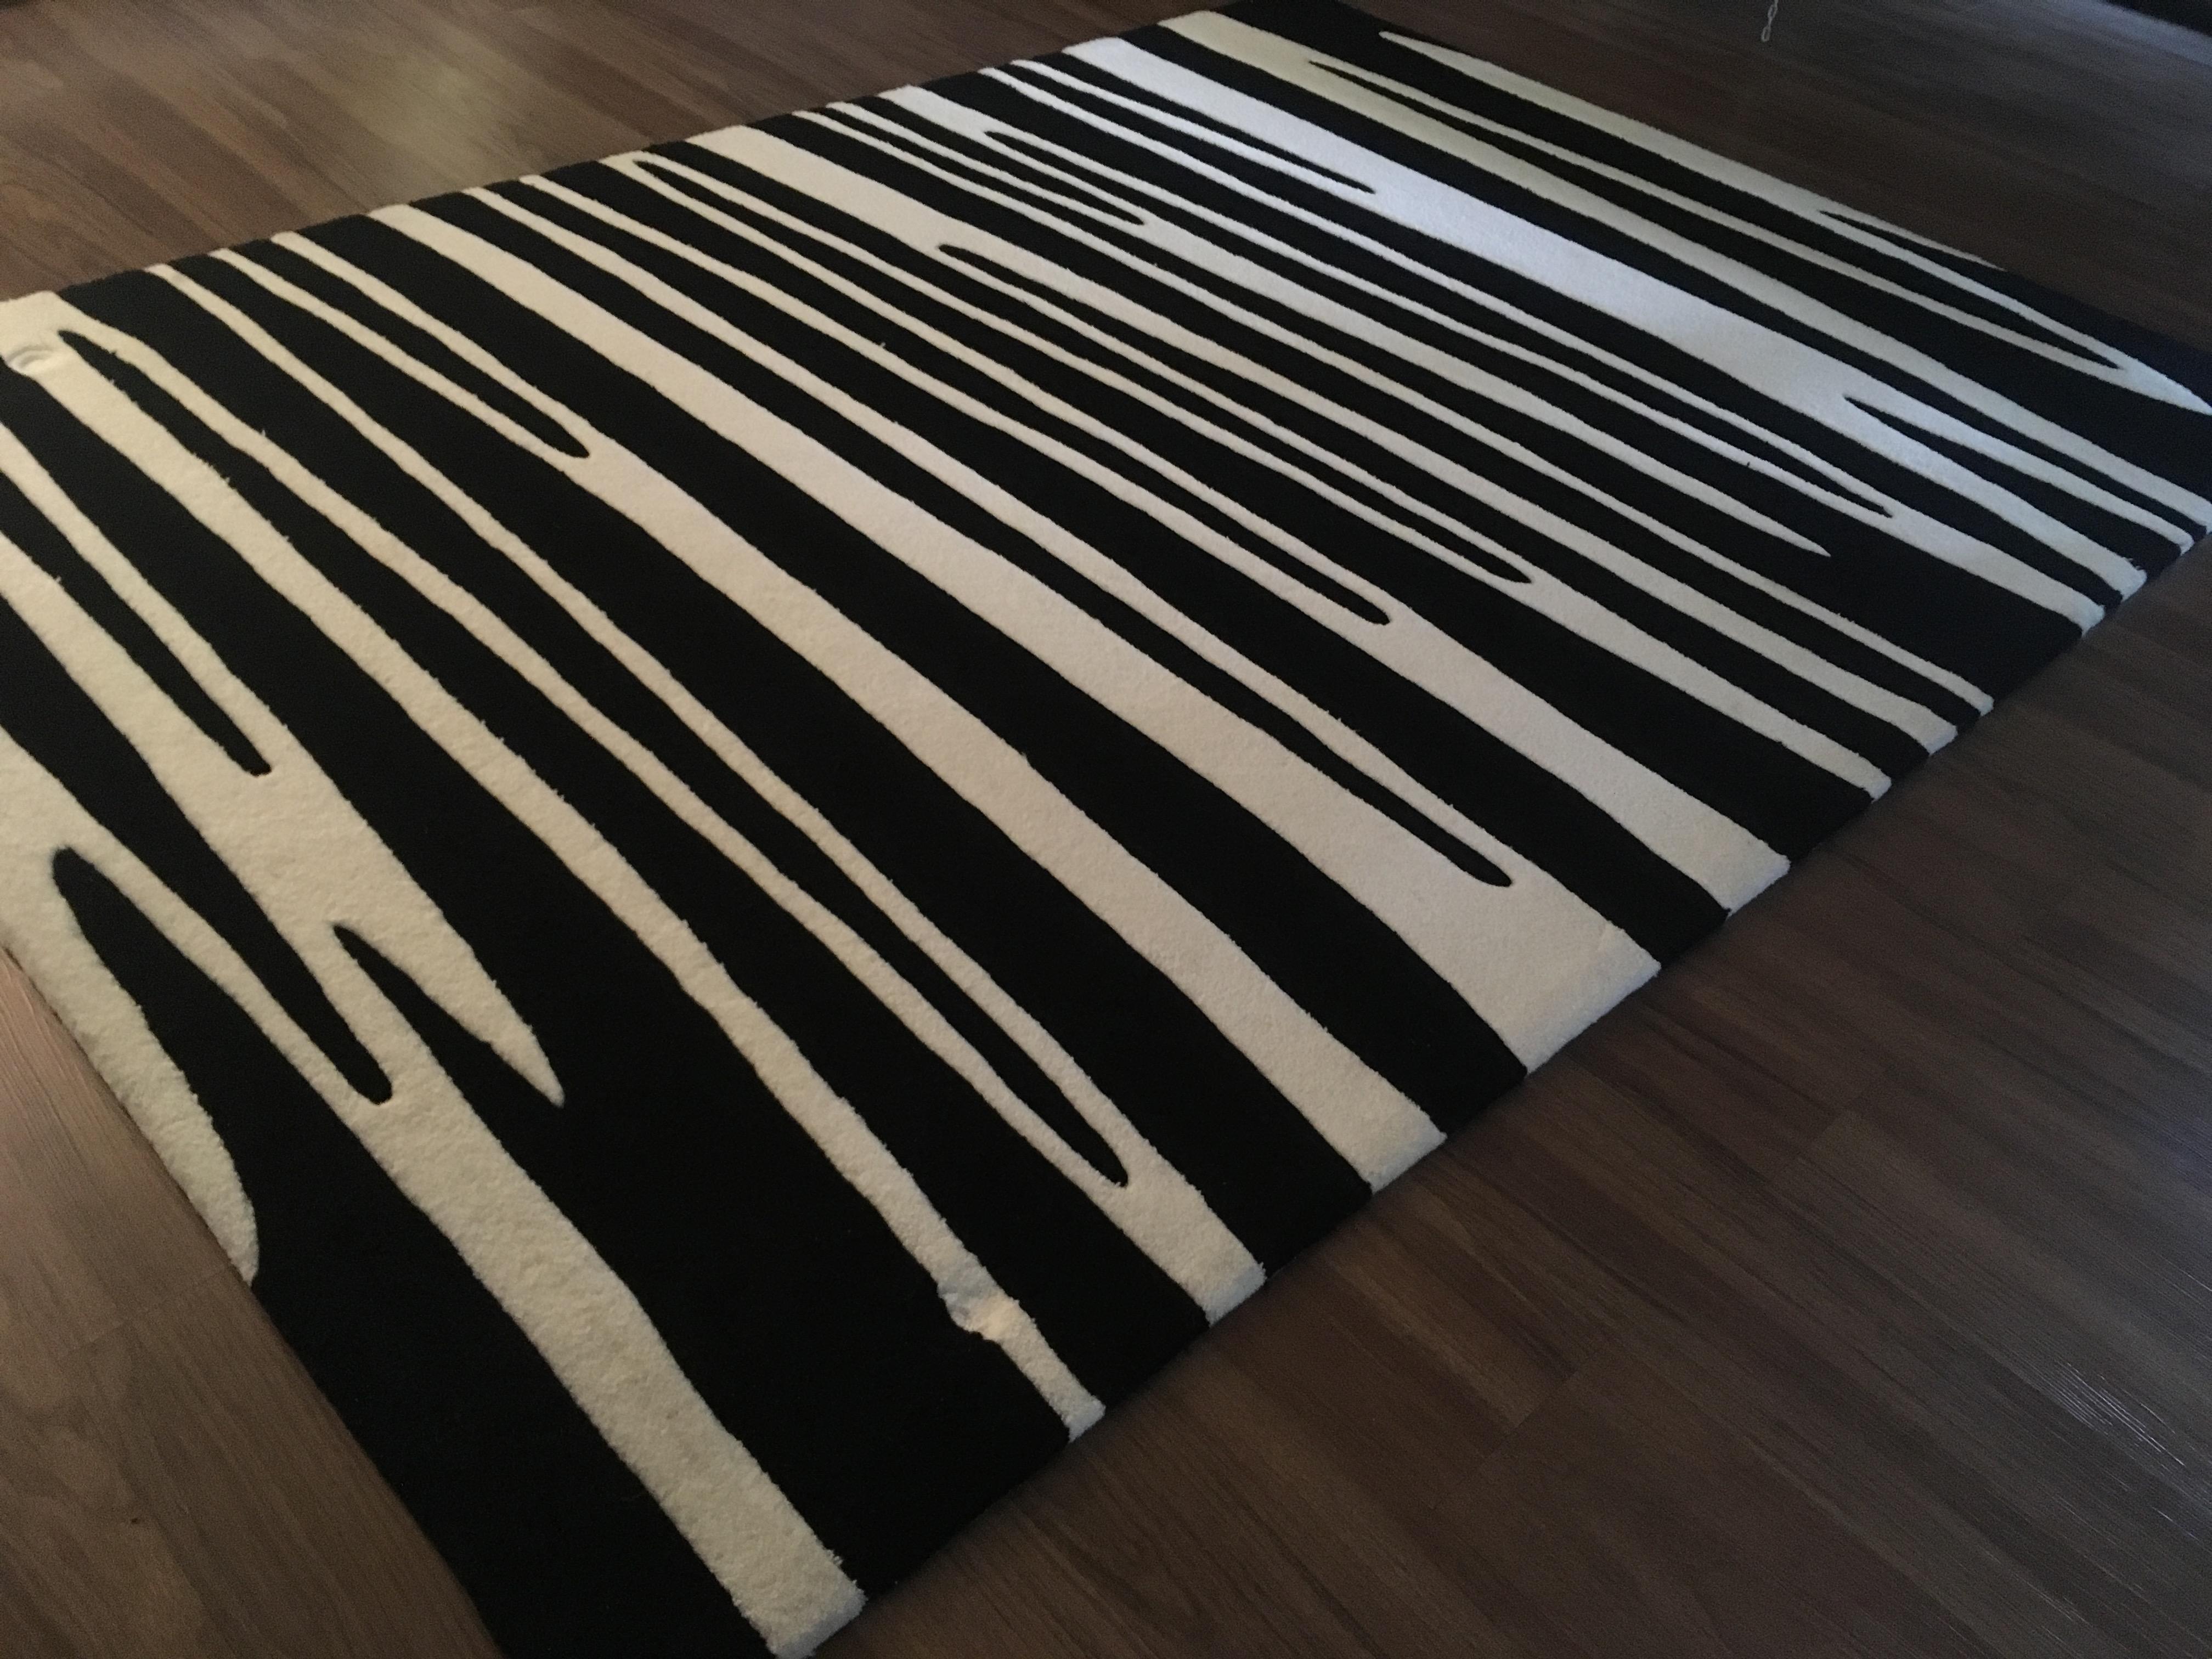 moderner teppich in schwarz wei tolles grafisches muster. Black Bedroom Furniture Sets. Home Design Ideas